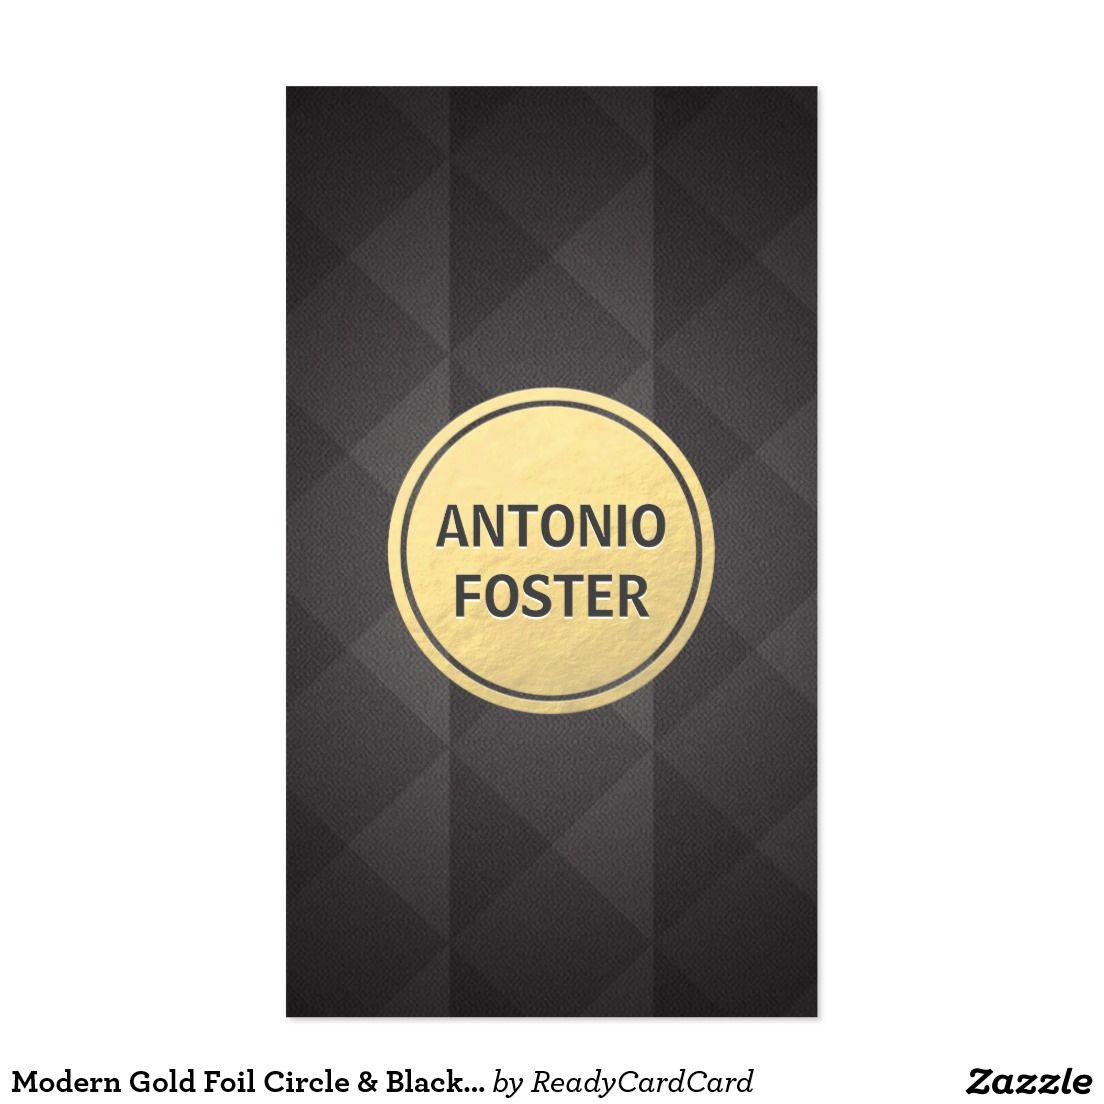 Diamond business card designs best business cards modern gold foil circle black diamond designer business card magicingreecefo Choice Image